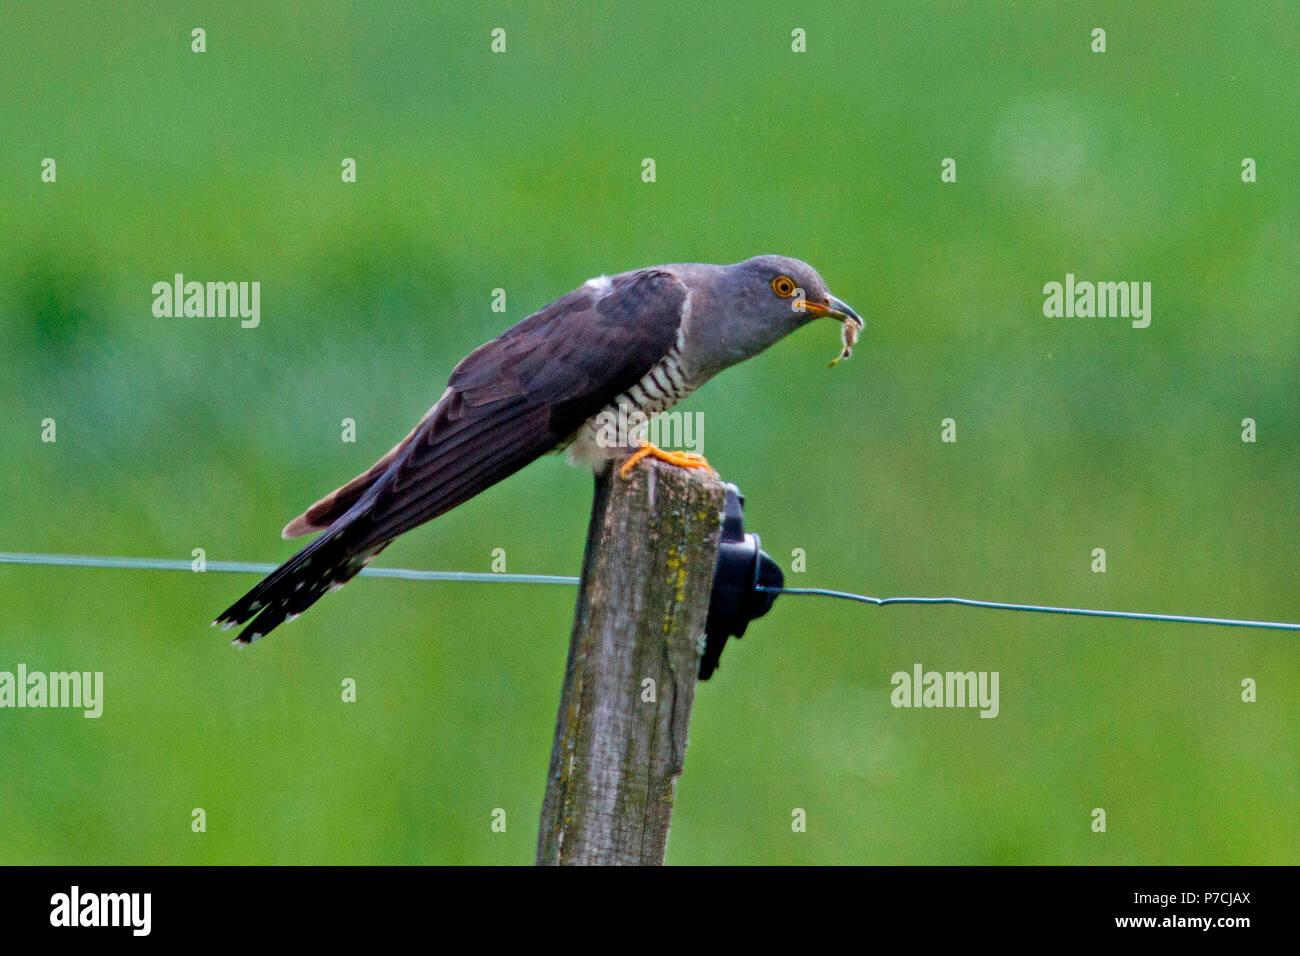 common cuckoo, (Cuculus canorus) - Stock Image